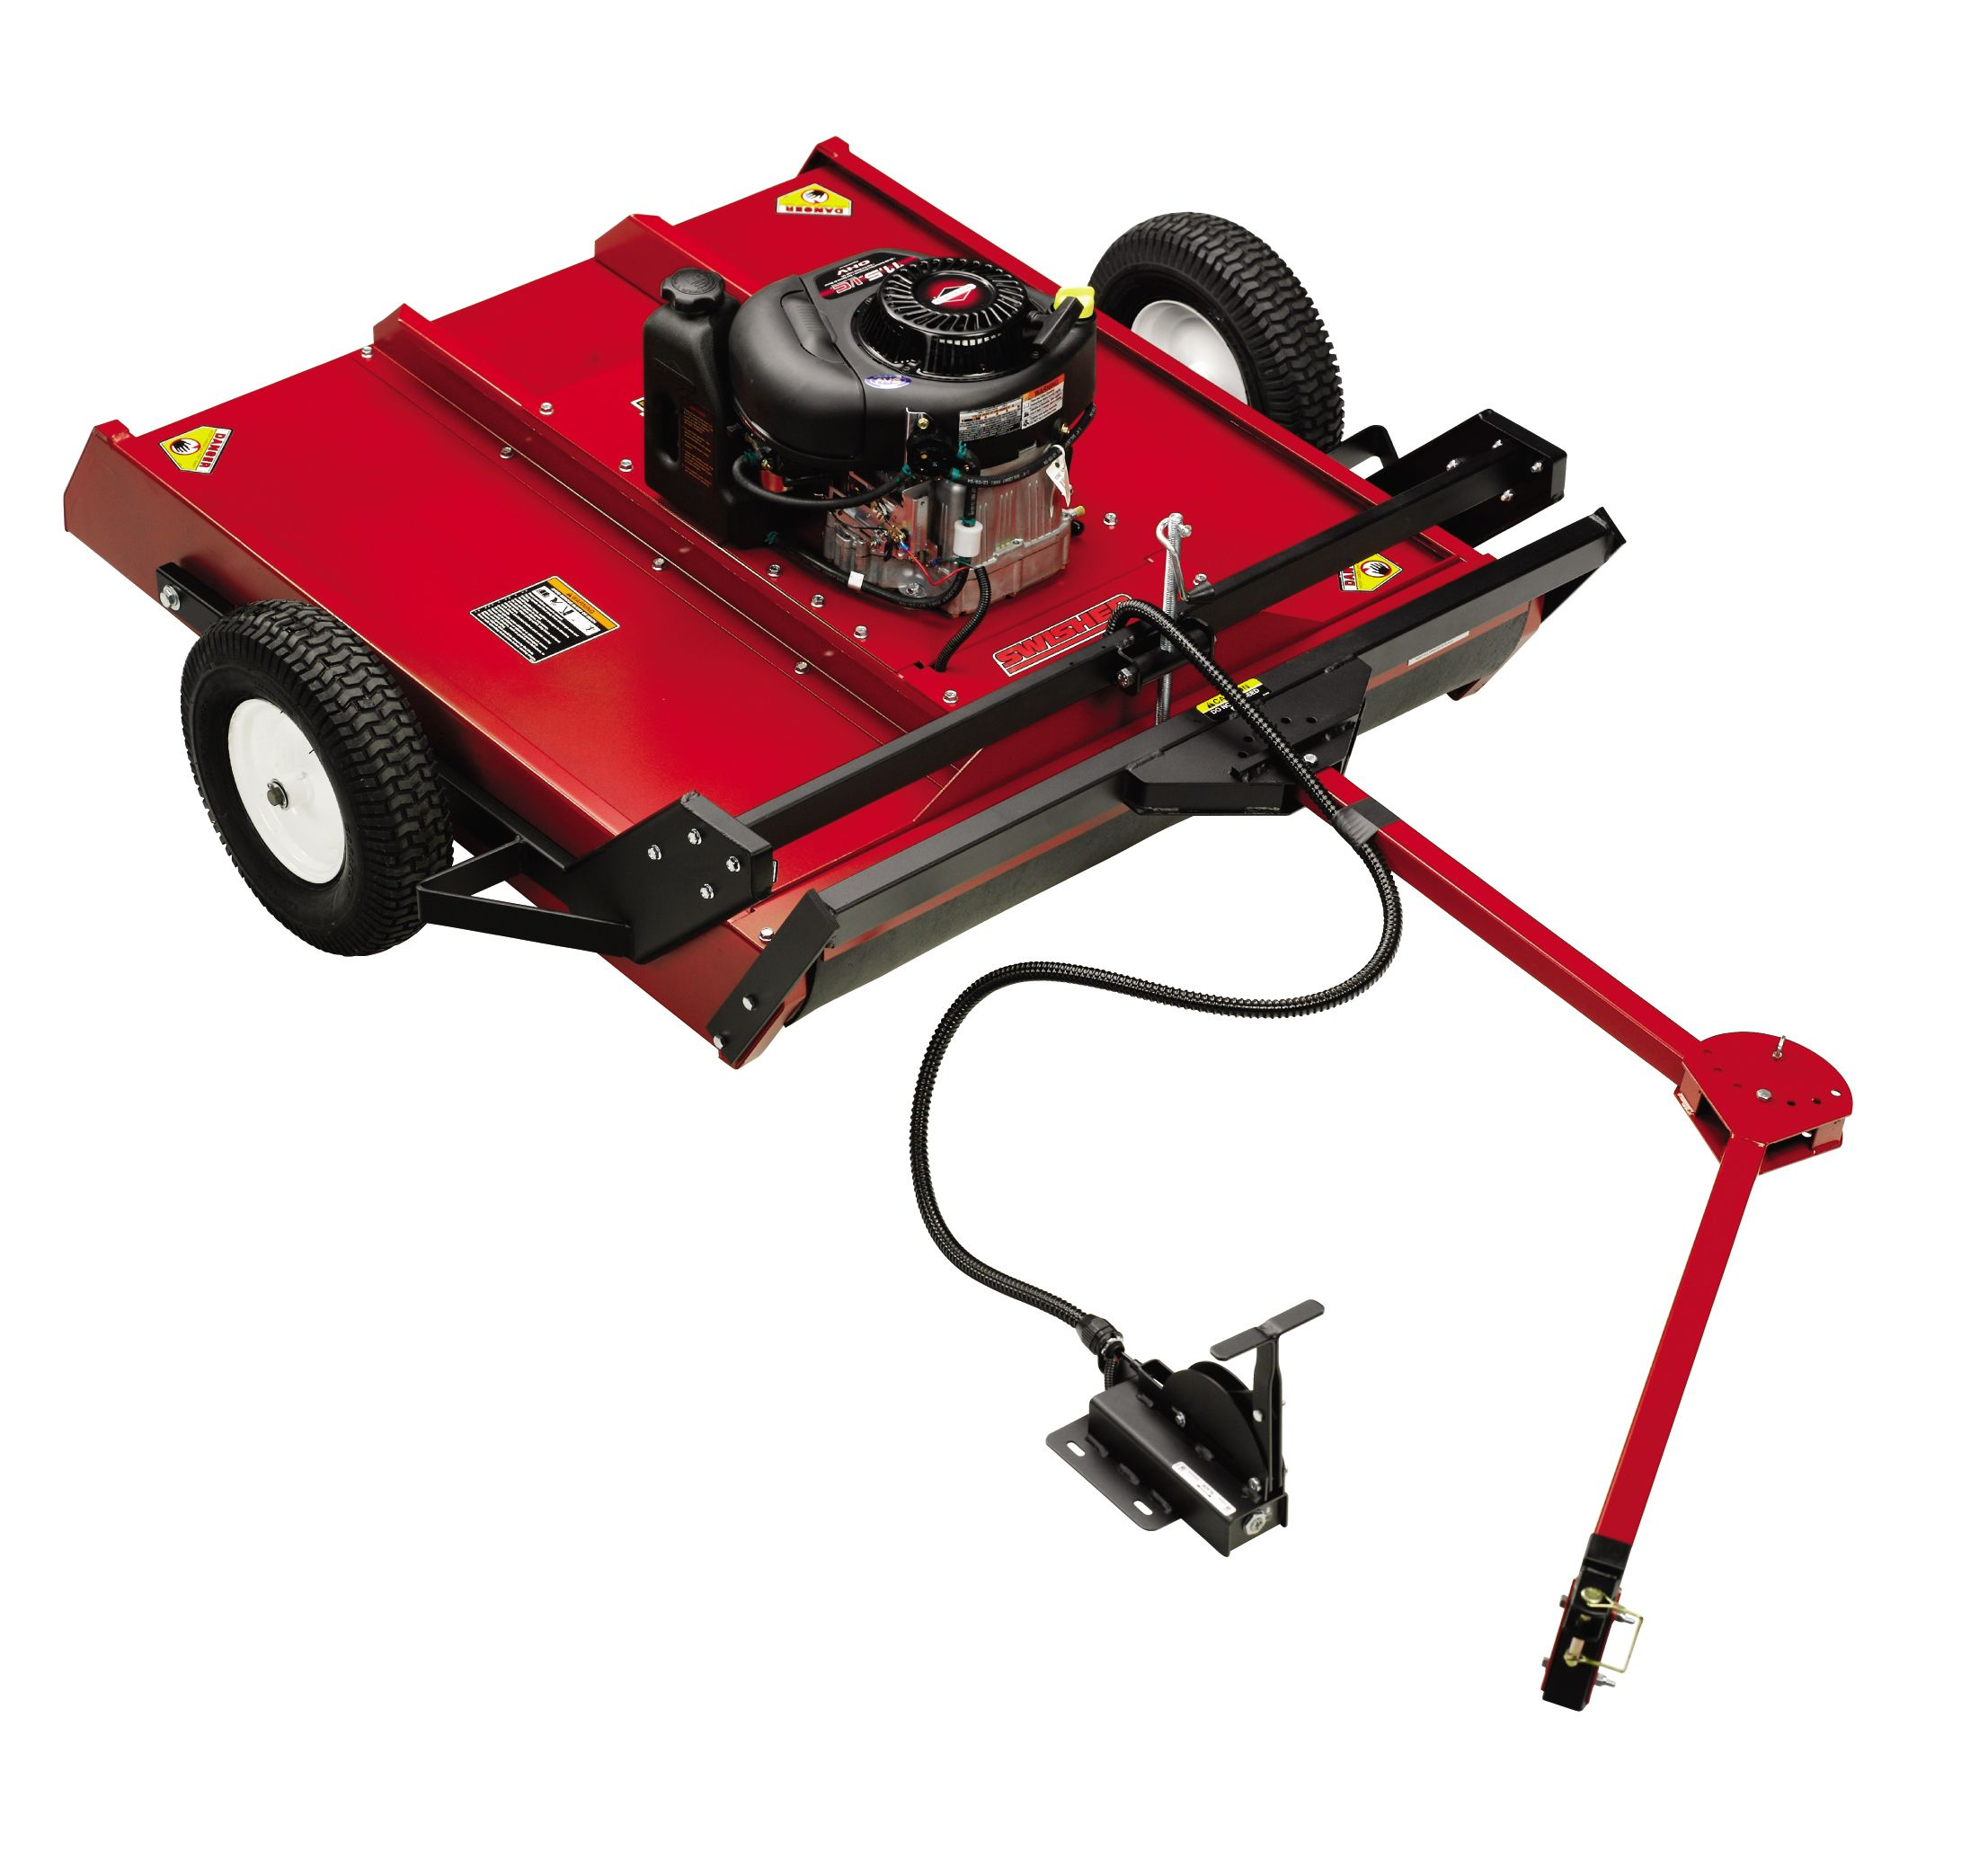 medium resolution of swisher t1260 mower wiring diagram trusted wiring diagram country clipper wiring diagram bush hog pz2561 wiring